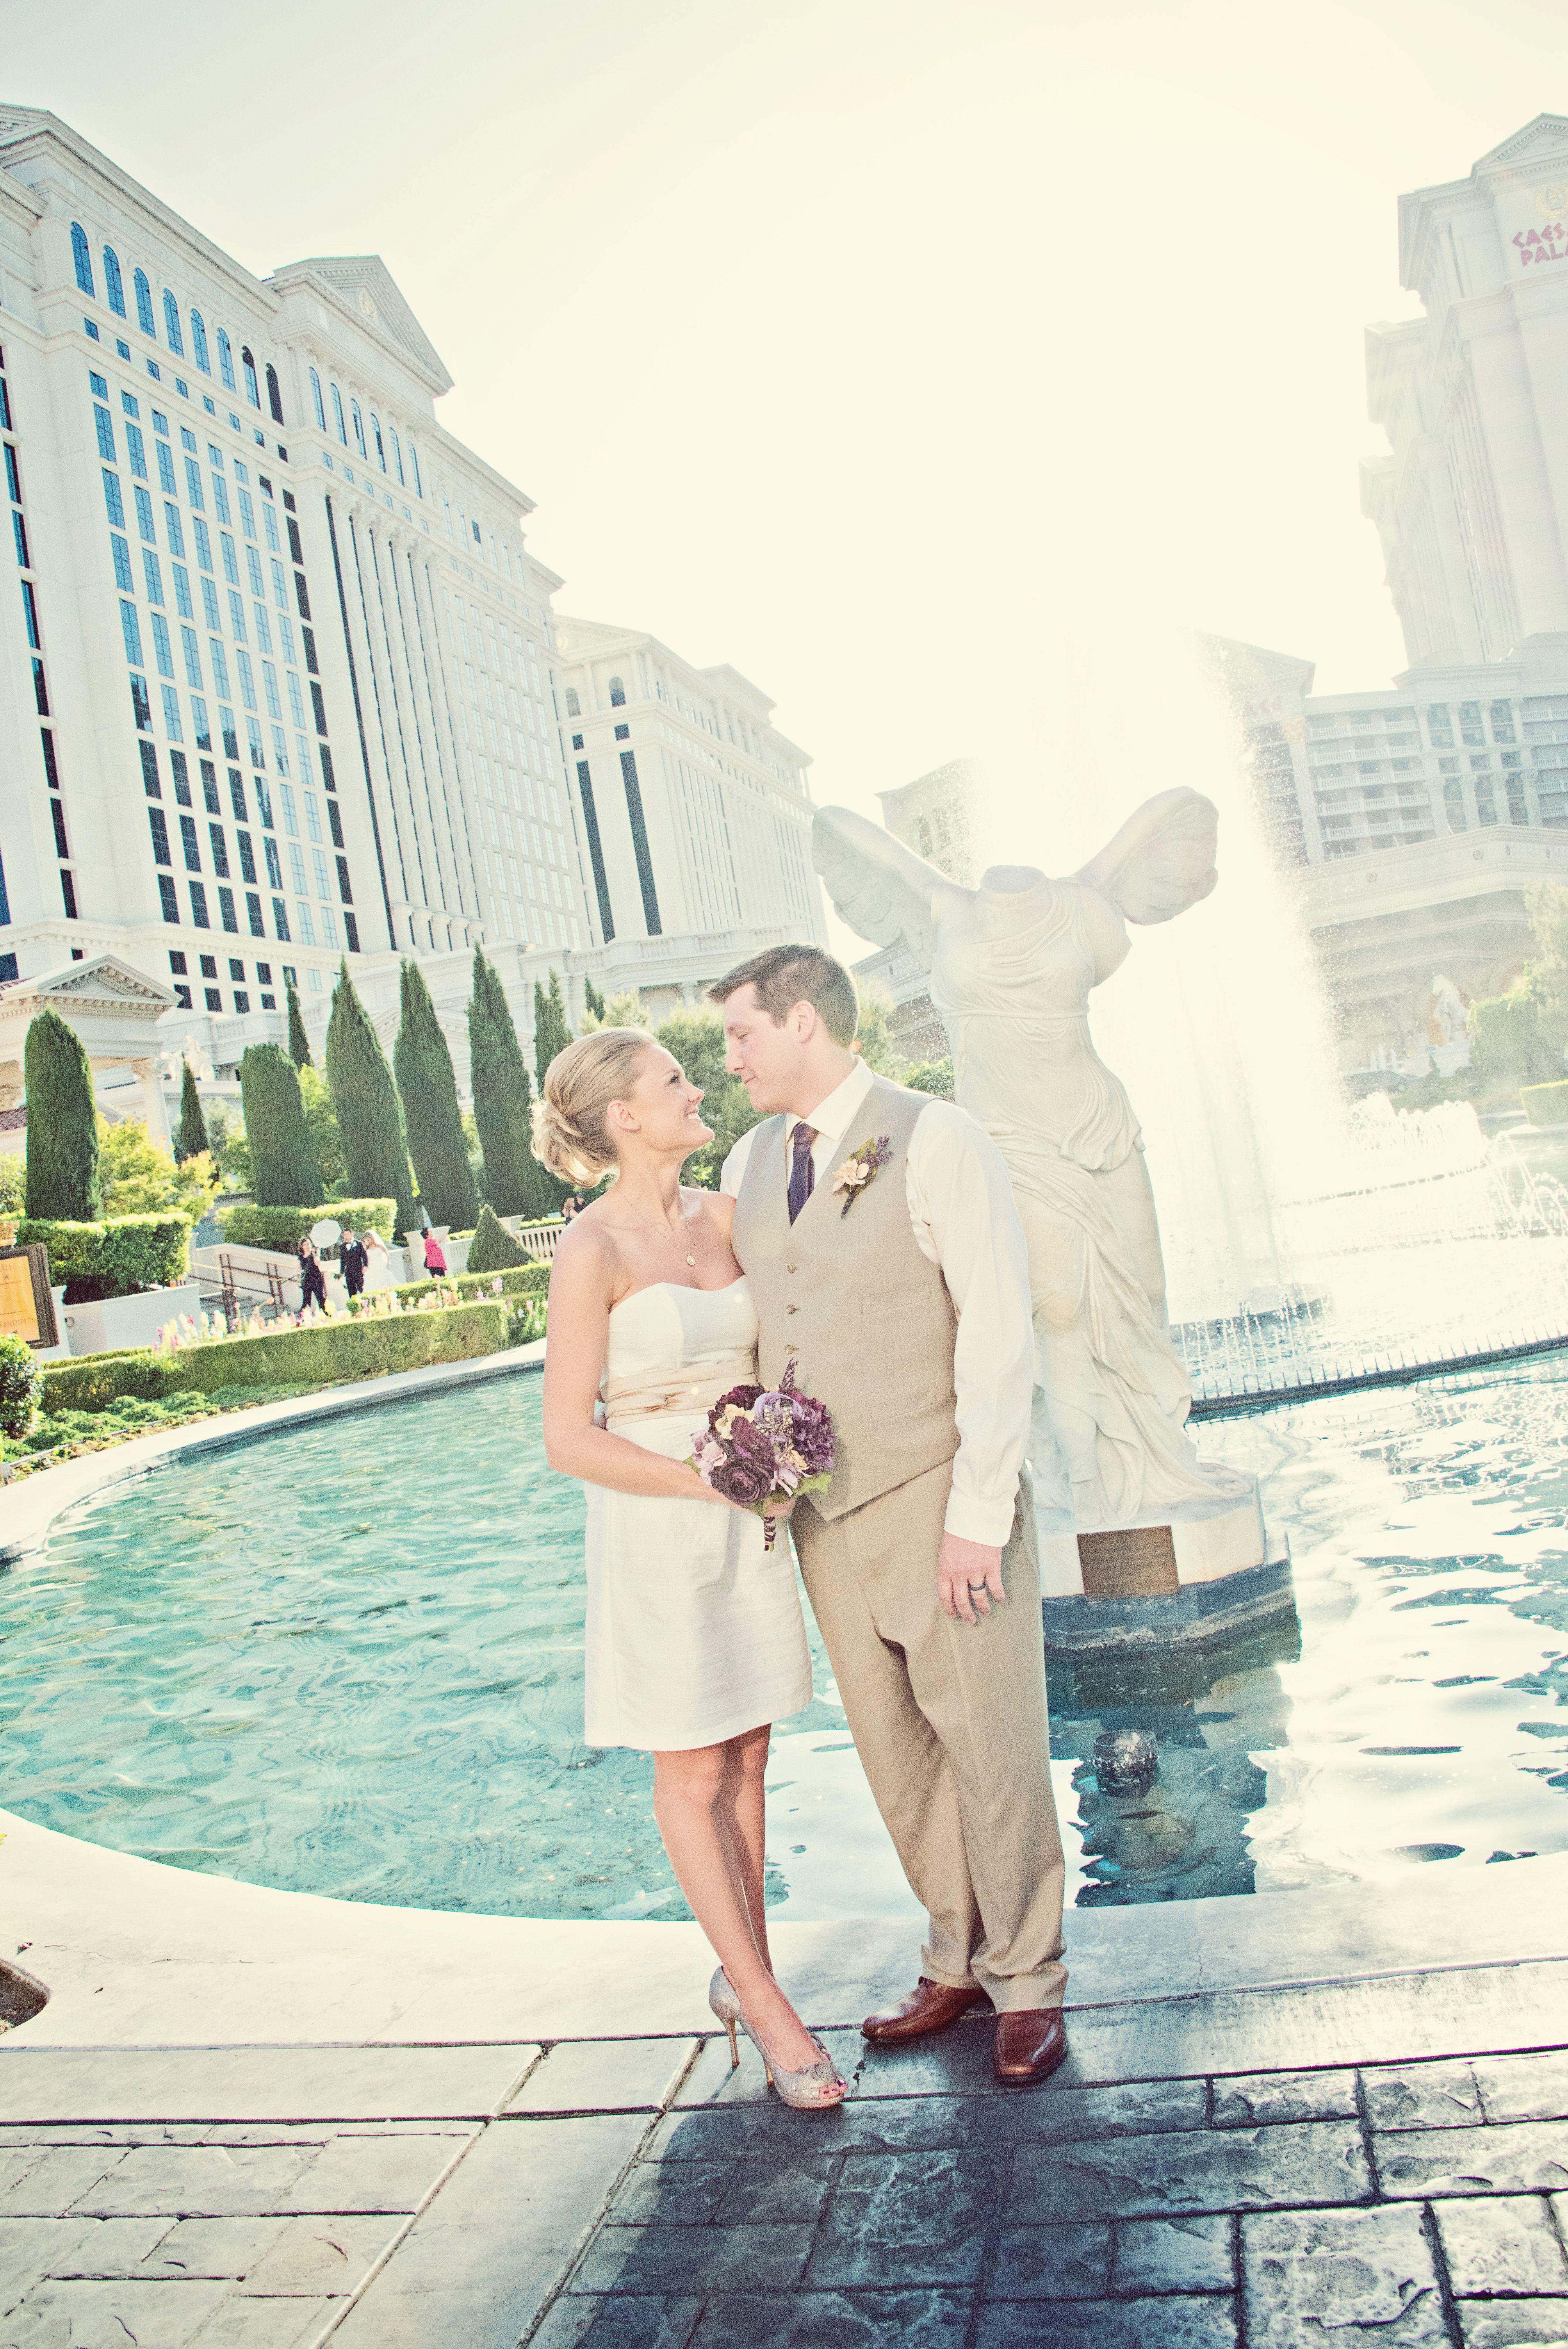 Caesars Palace Wedding Caesars palace wedding, Palace